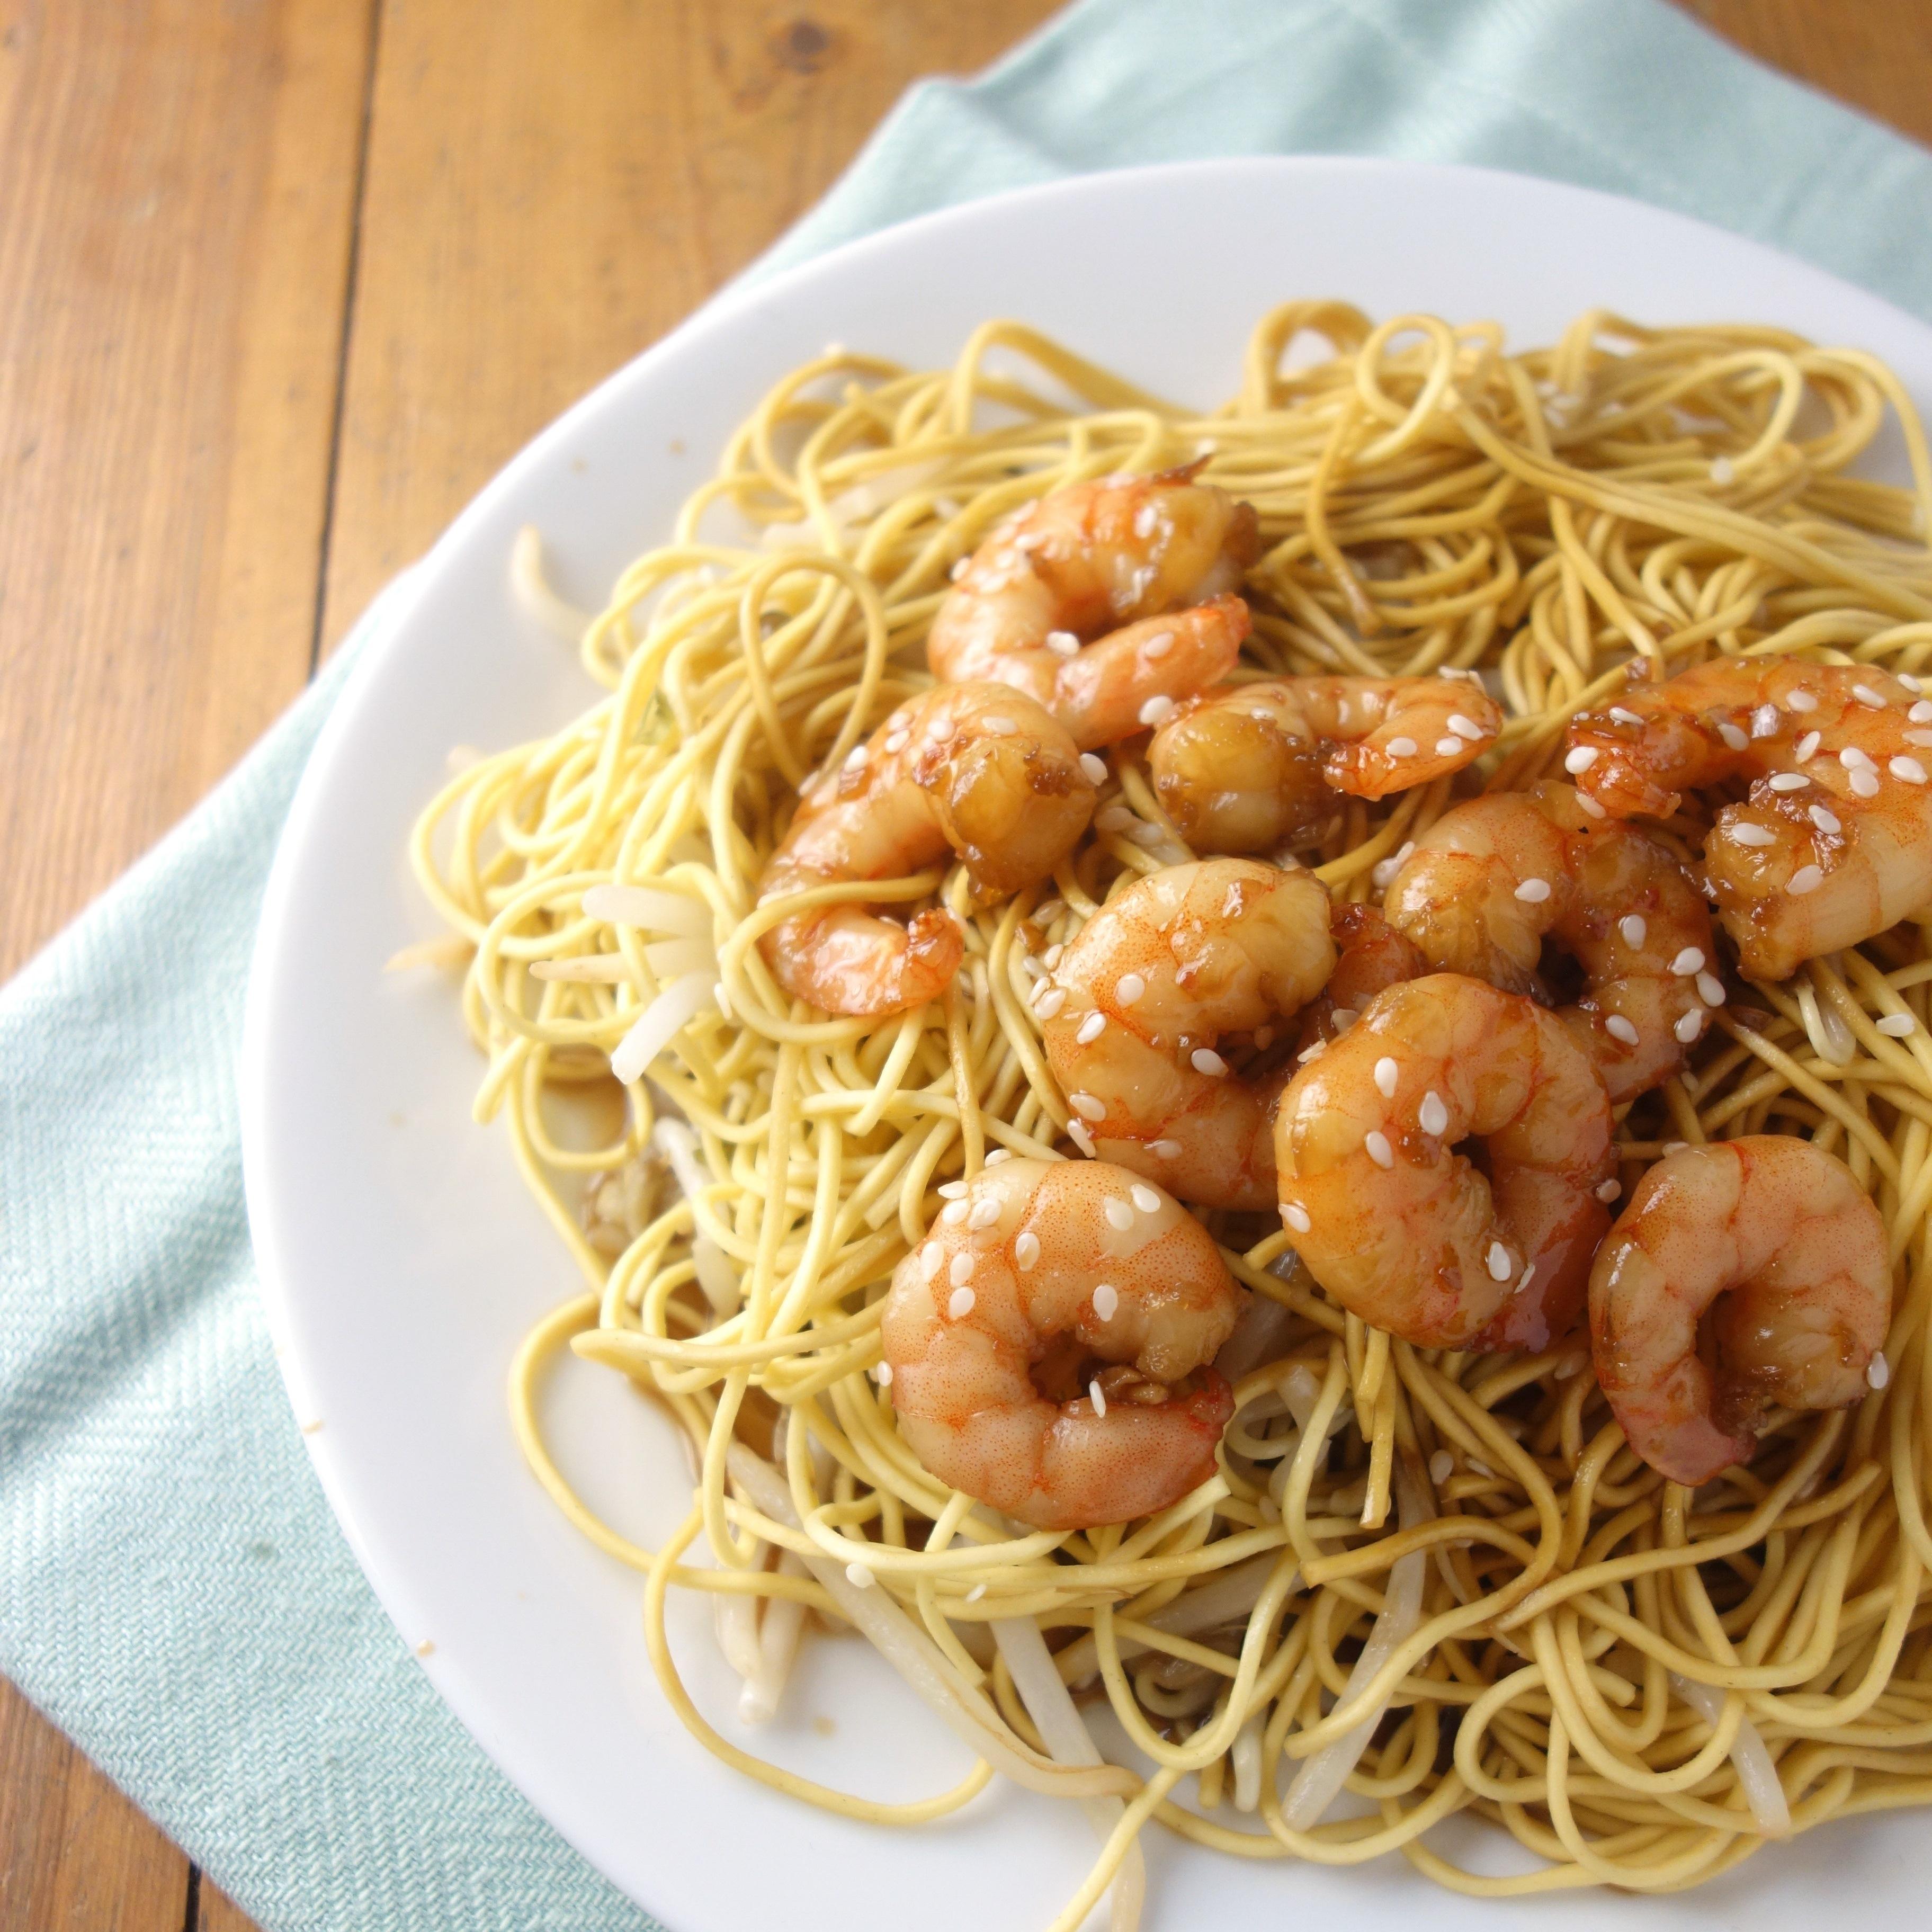 Teriyaki Glazed Prawns + Sesame Noodles